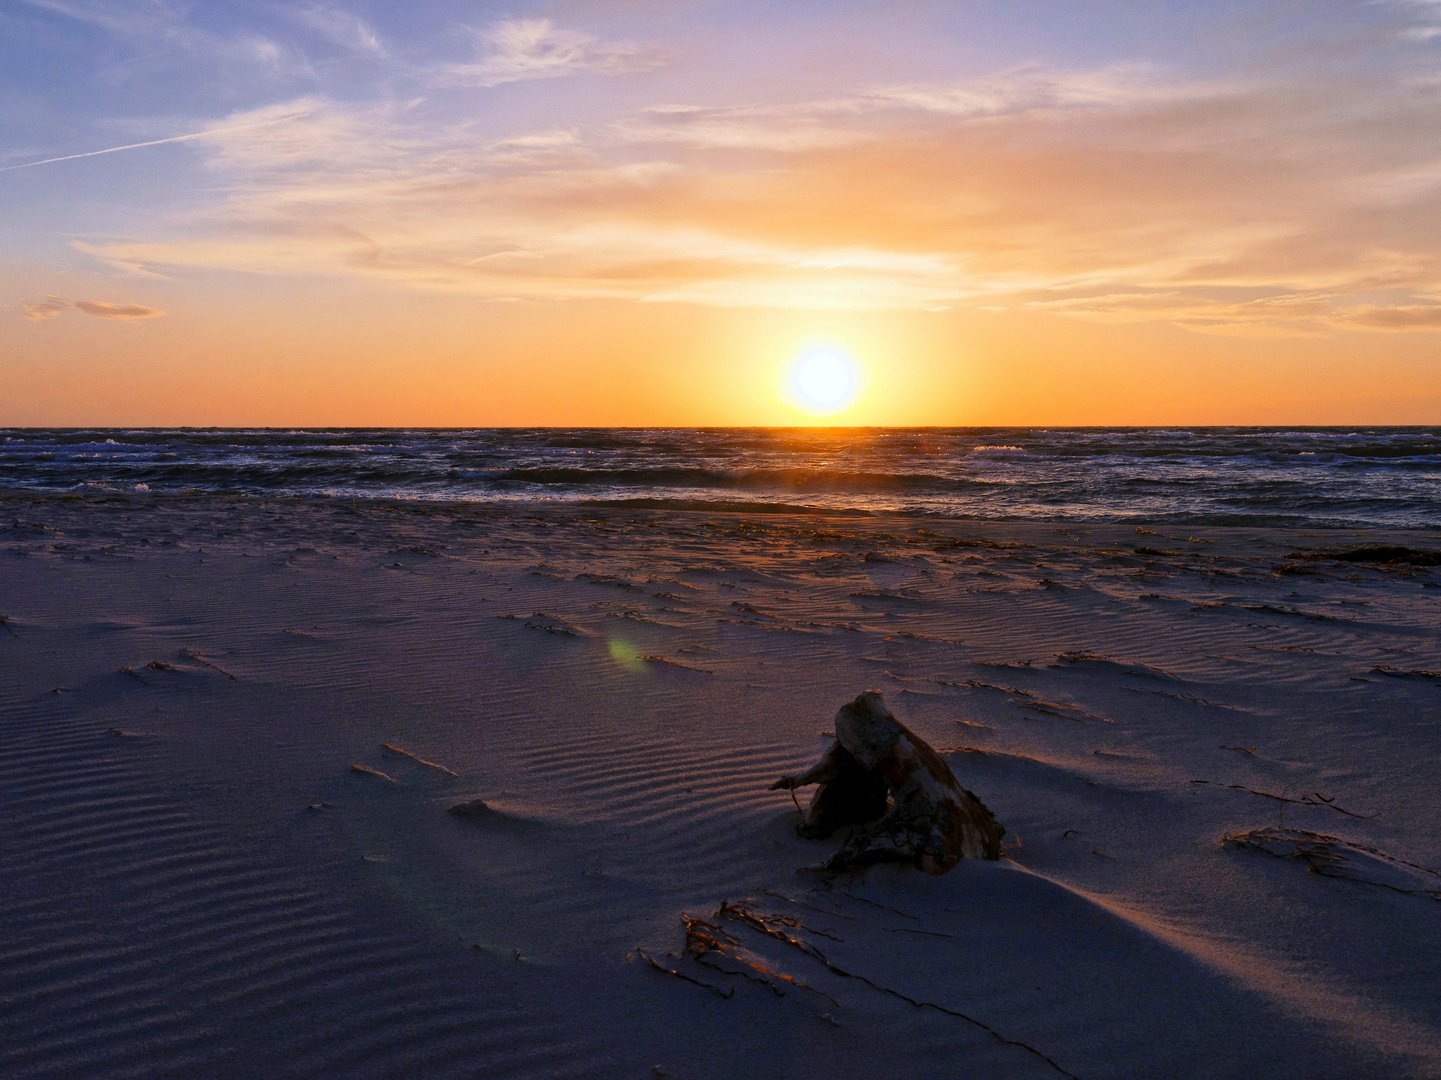 Darßer Ort - Sonnenuntergang am Weststrand